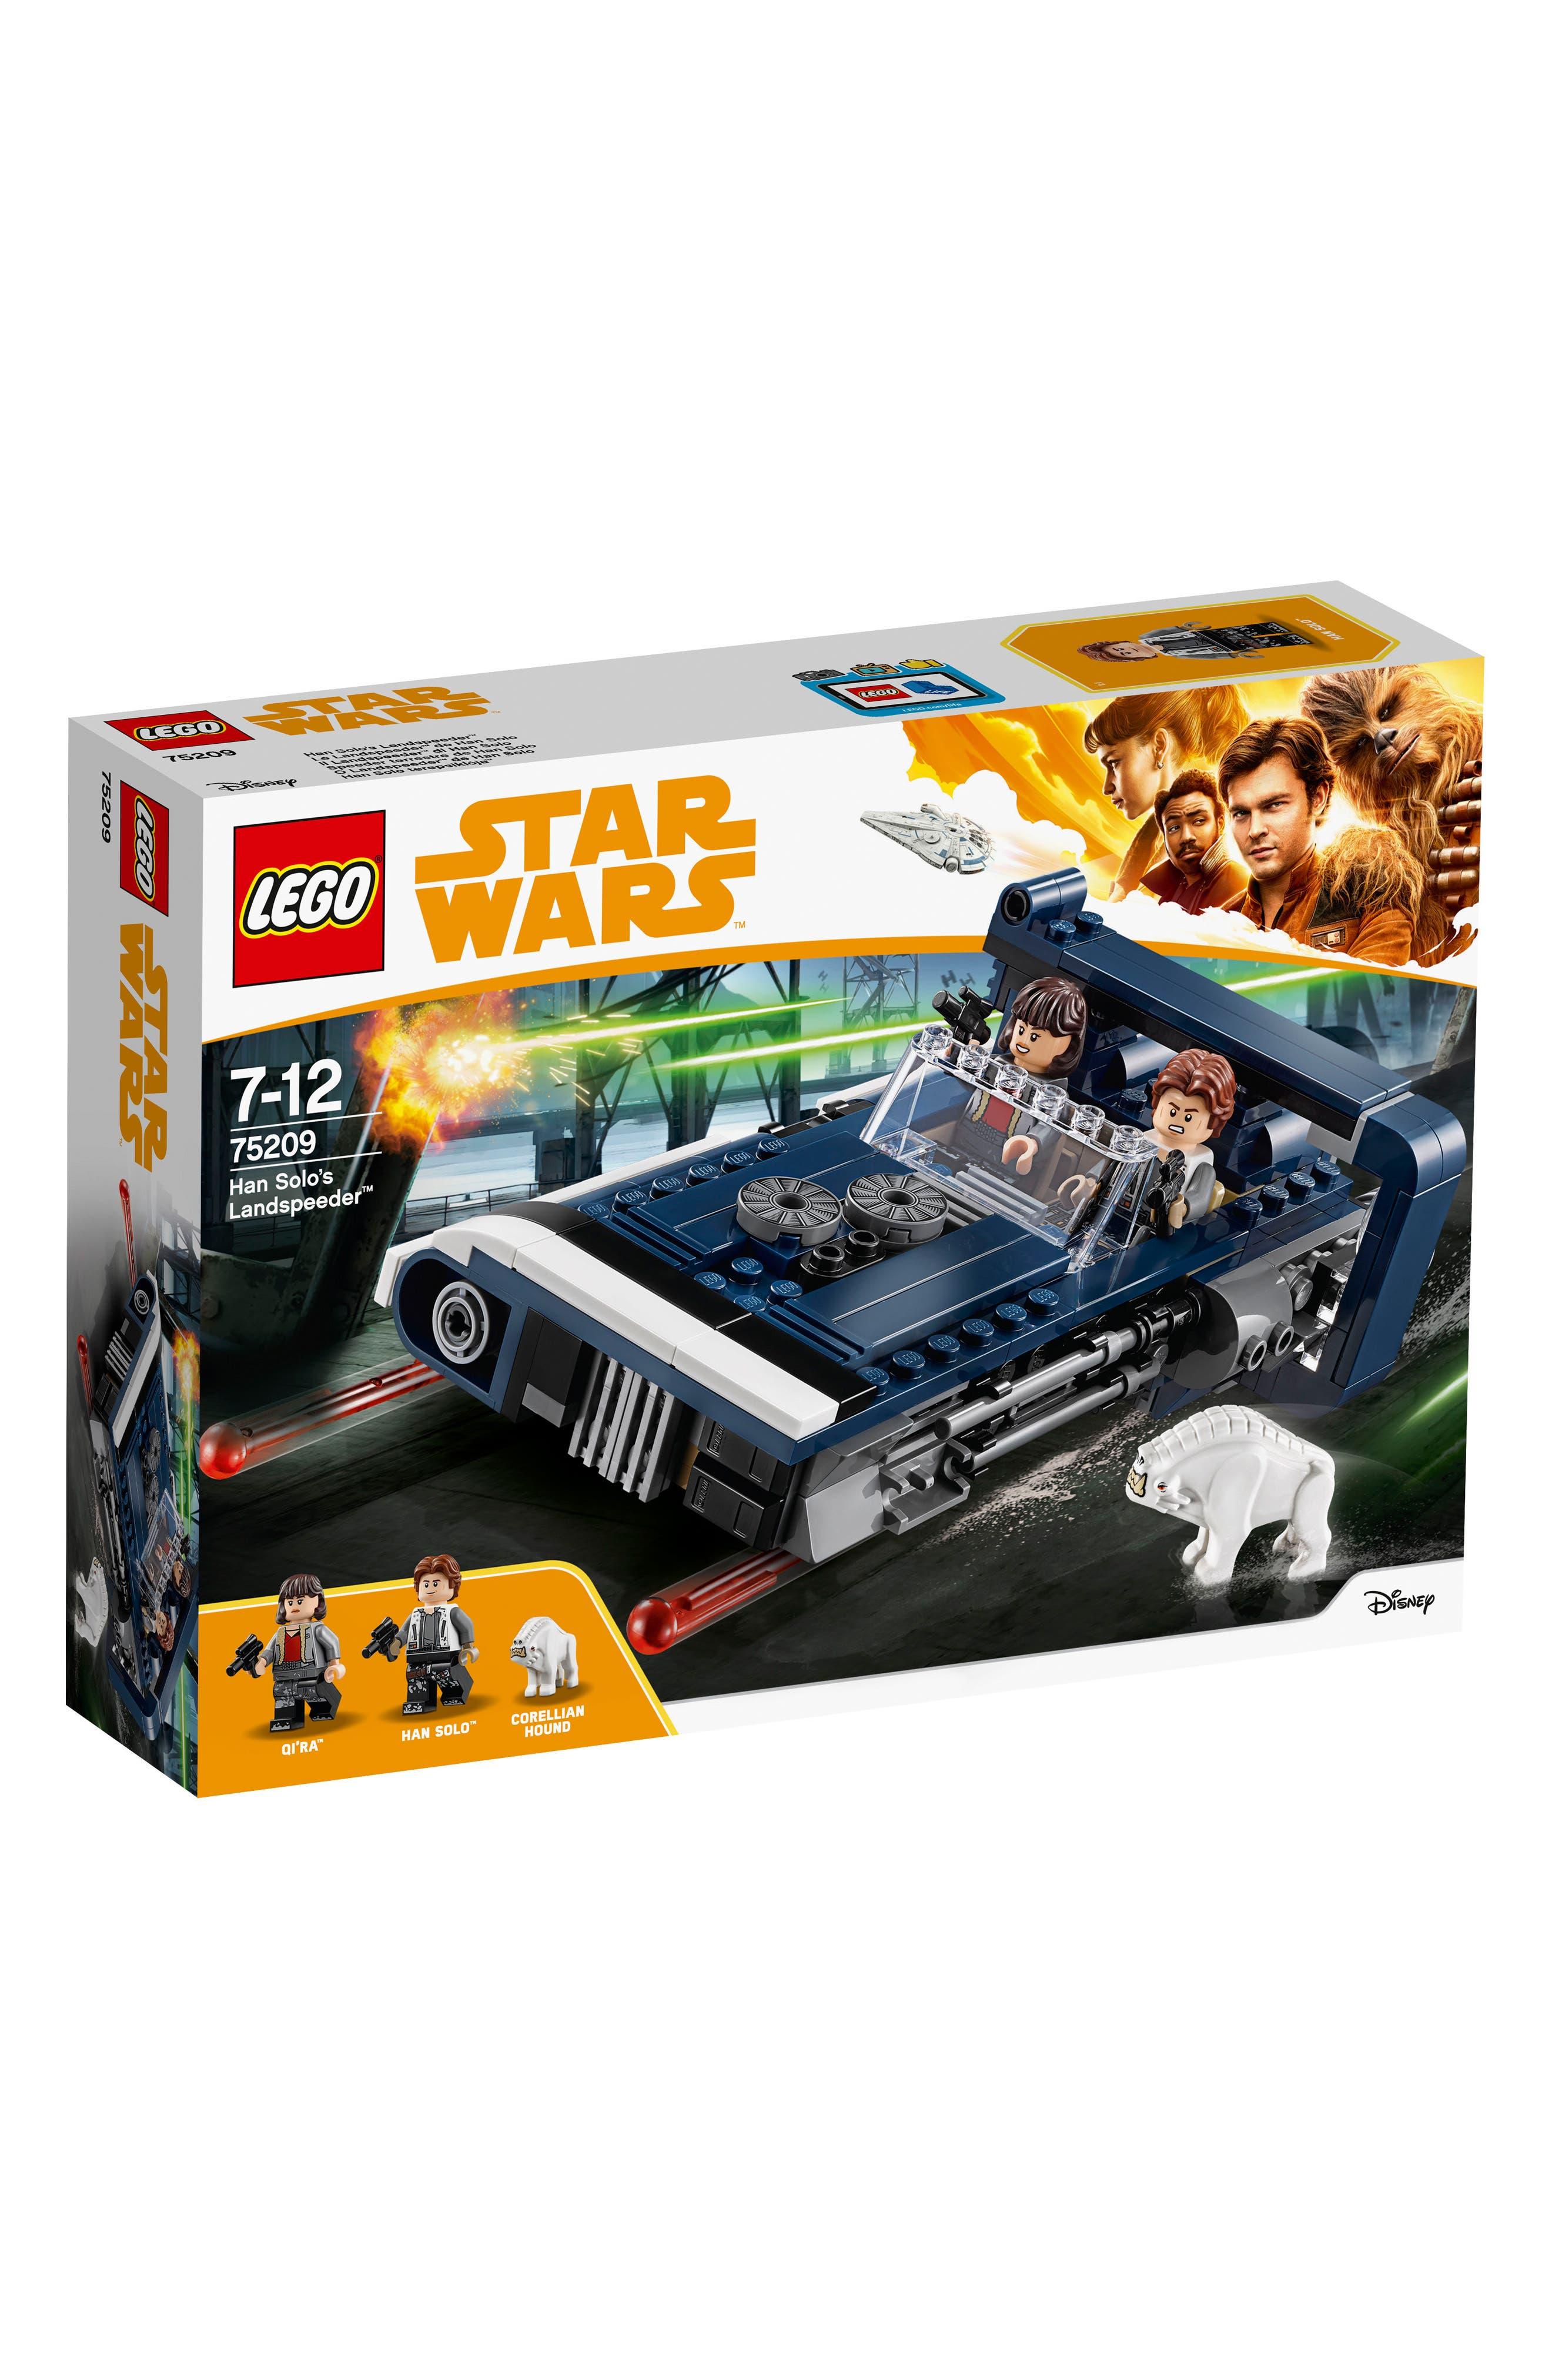 Star Wars<sup>®</sup> Han Solo's Landspeeder<sup>™</sup> - 75209,                             Main thumbnail 1, color,                             400